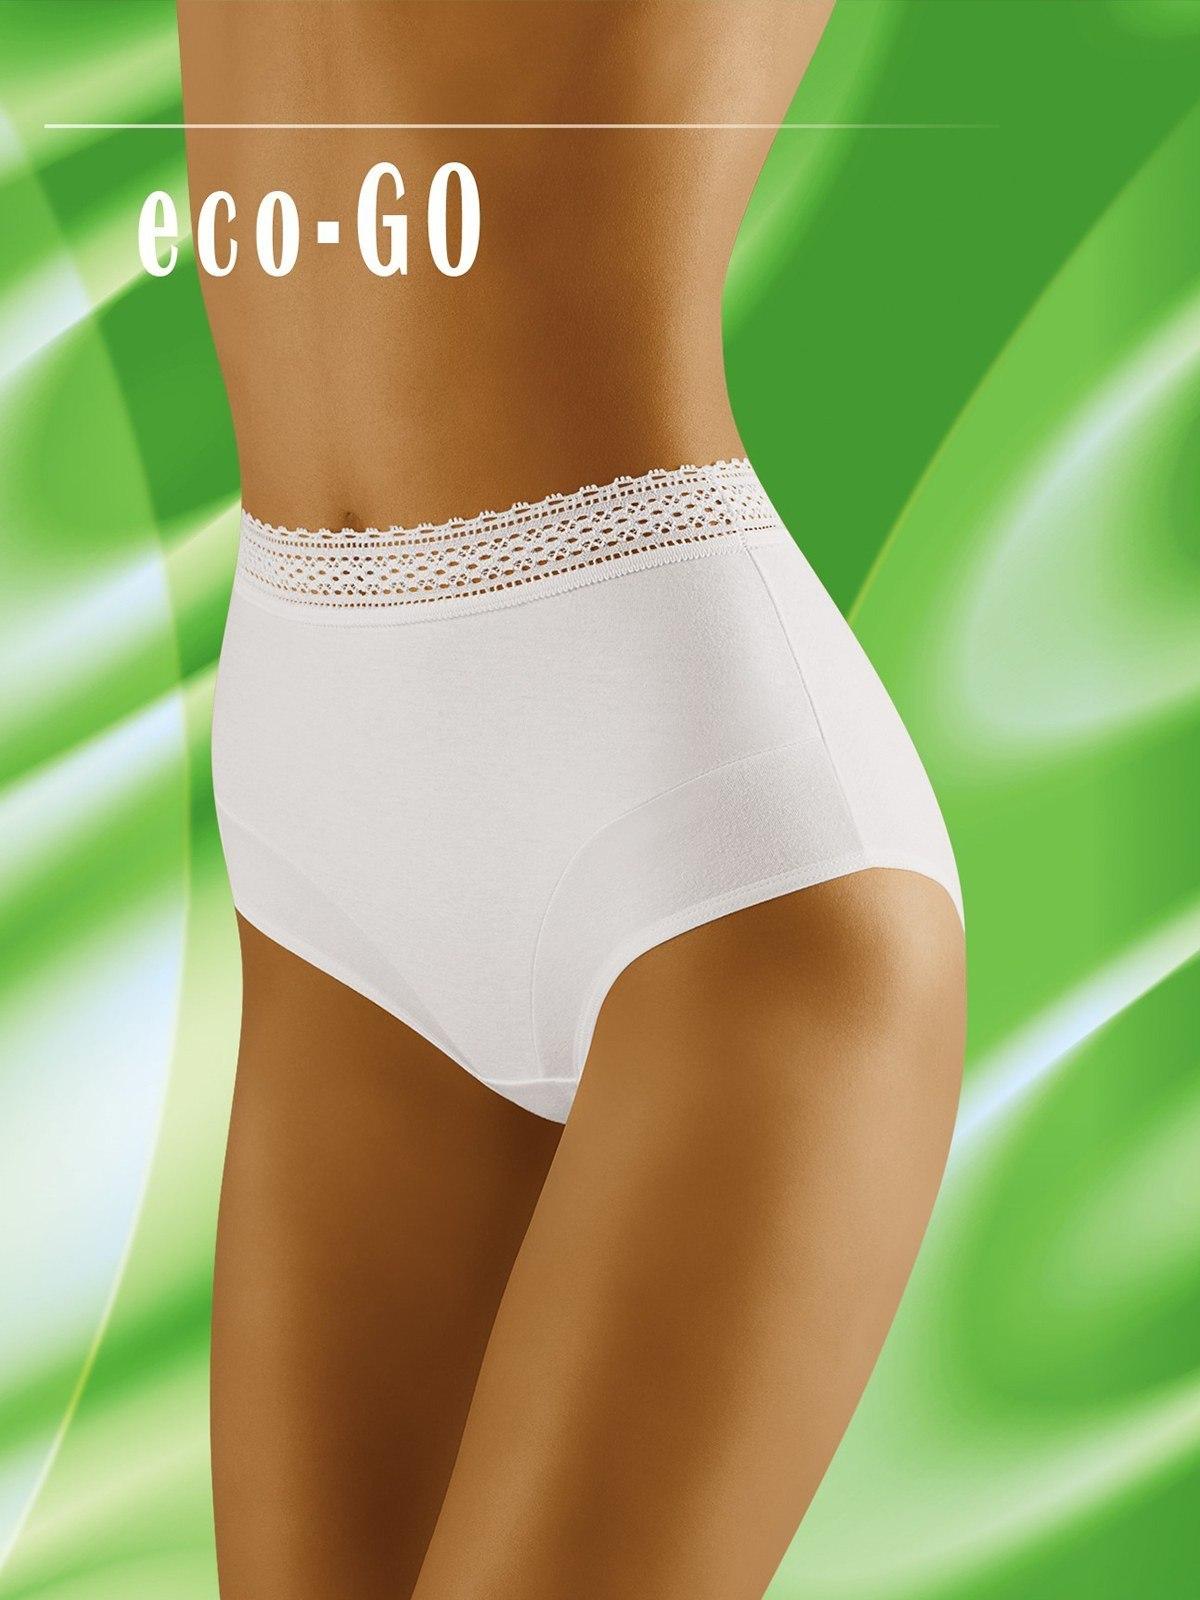 d6e6b0a3e67584 Figi ECO GO ➜ Wolbar ➜ Sklep internetowy z bielizną damską i męską ...